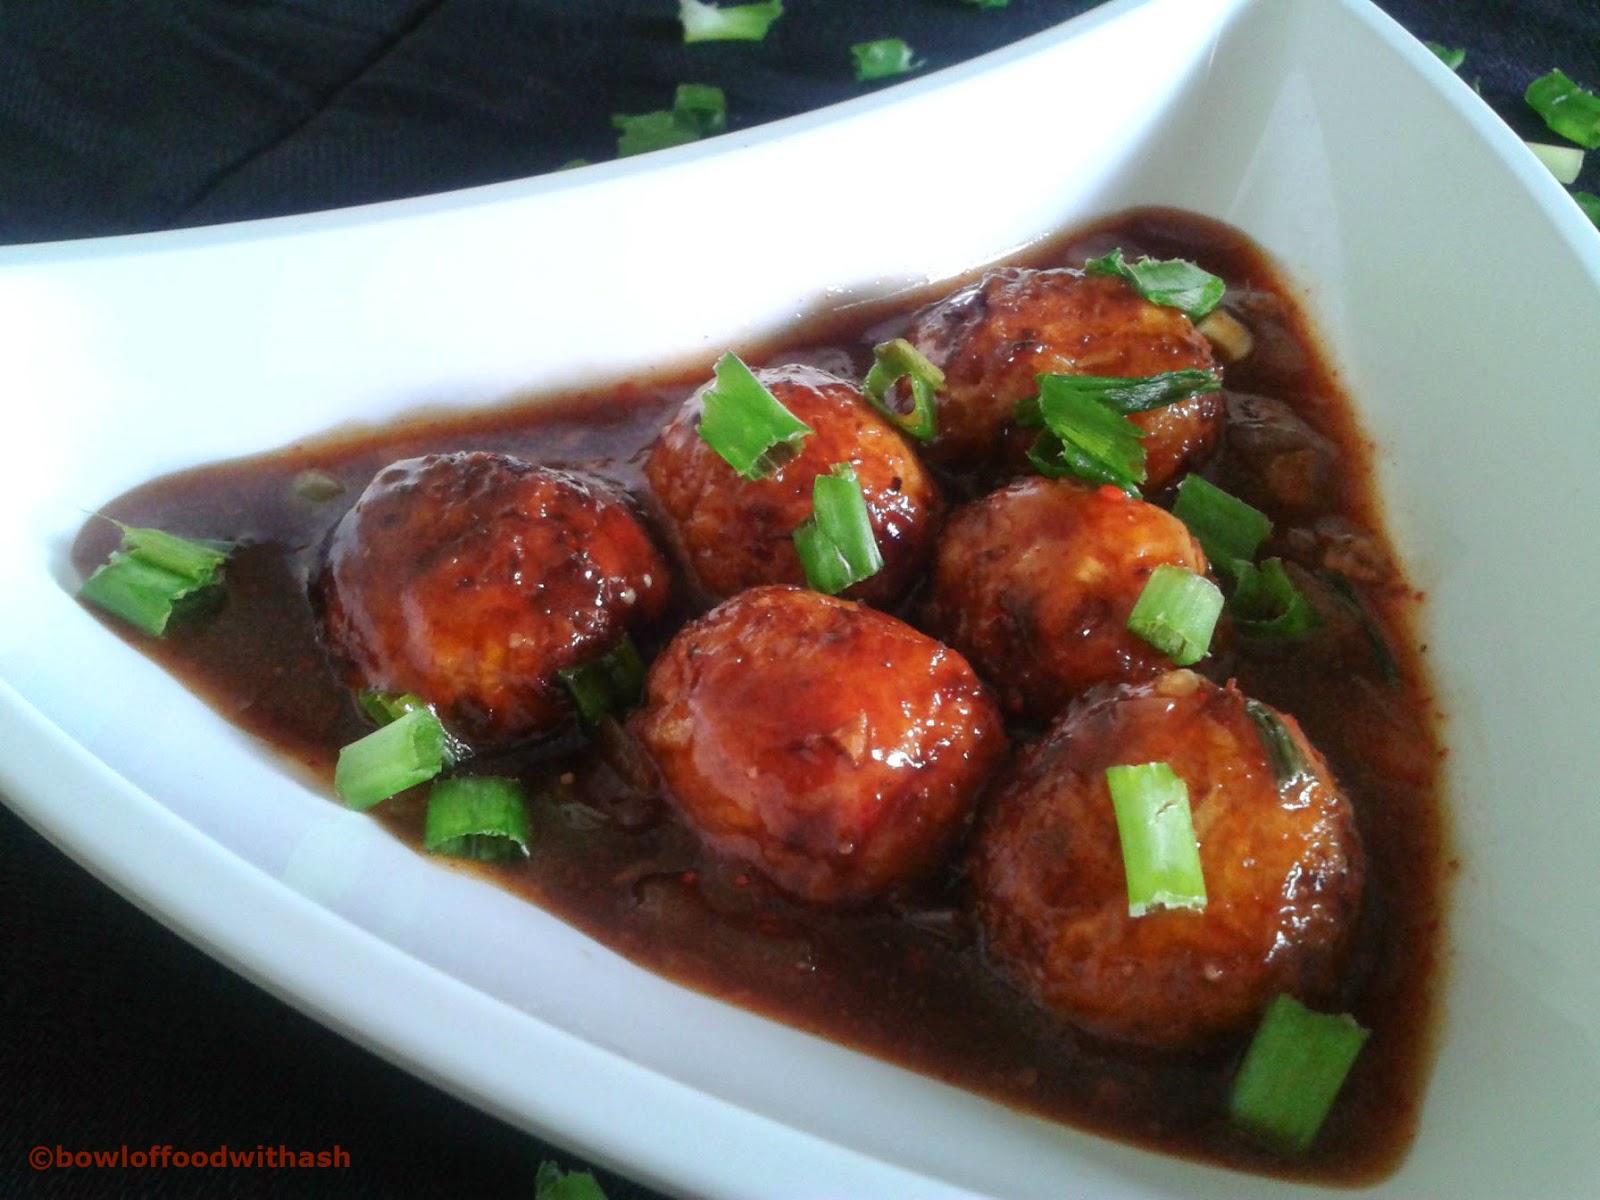 ... Of Food With Ash: Veg Manchurian Recipe | How to make Veg Manchurian